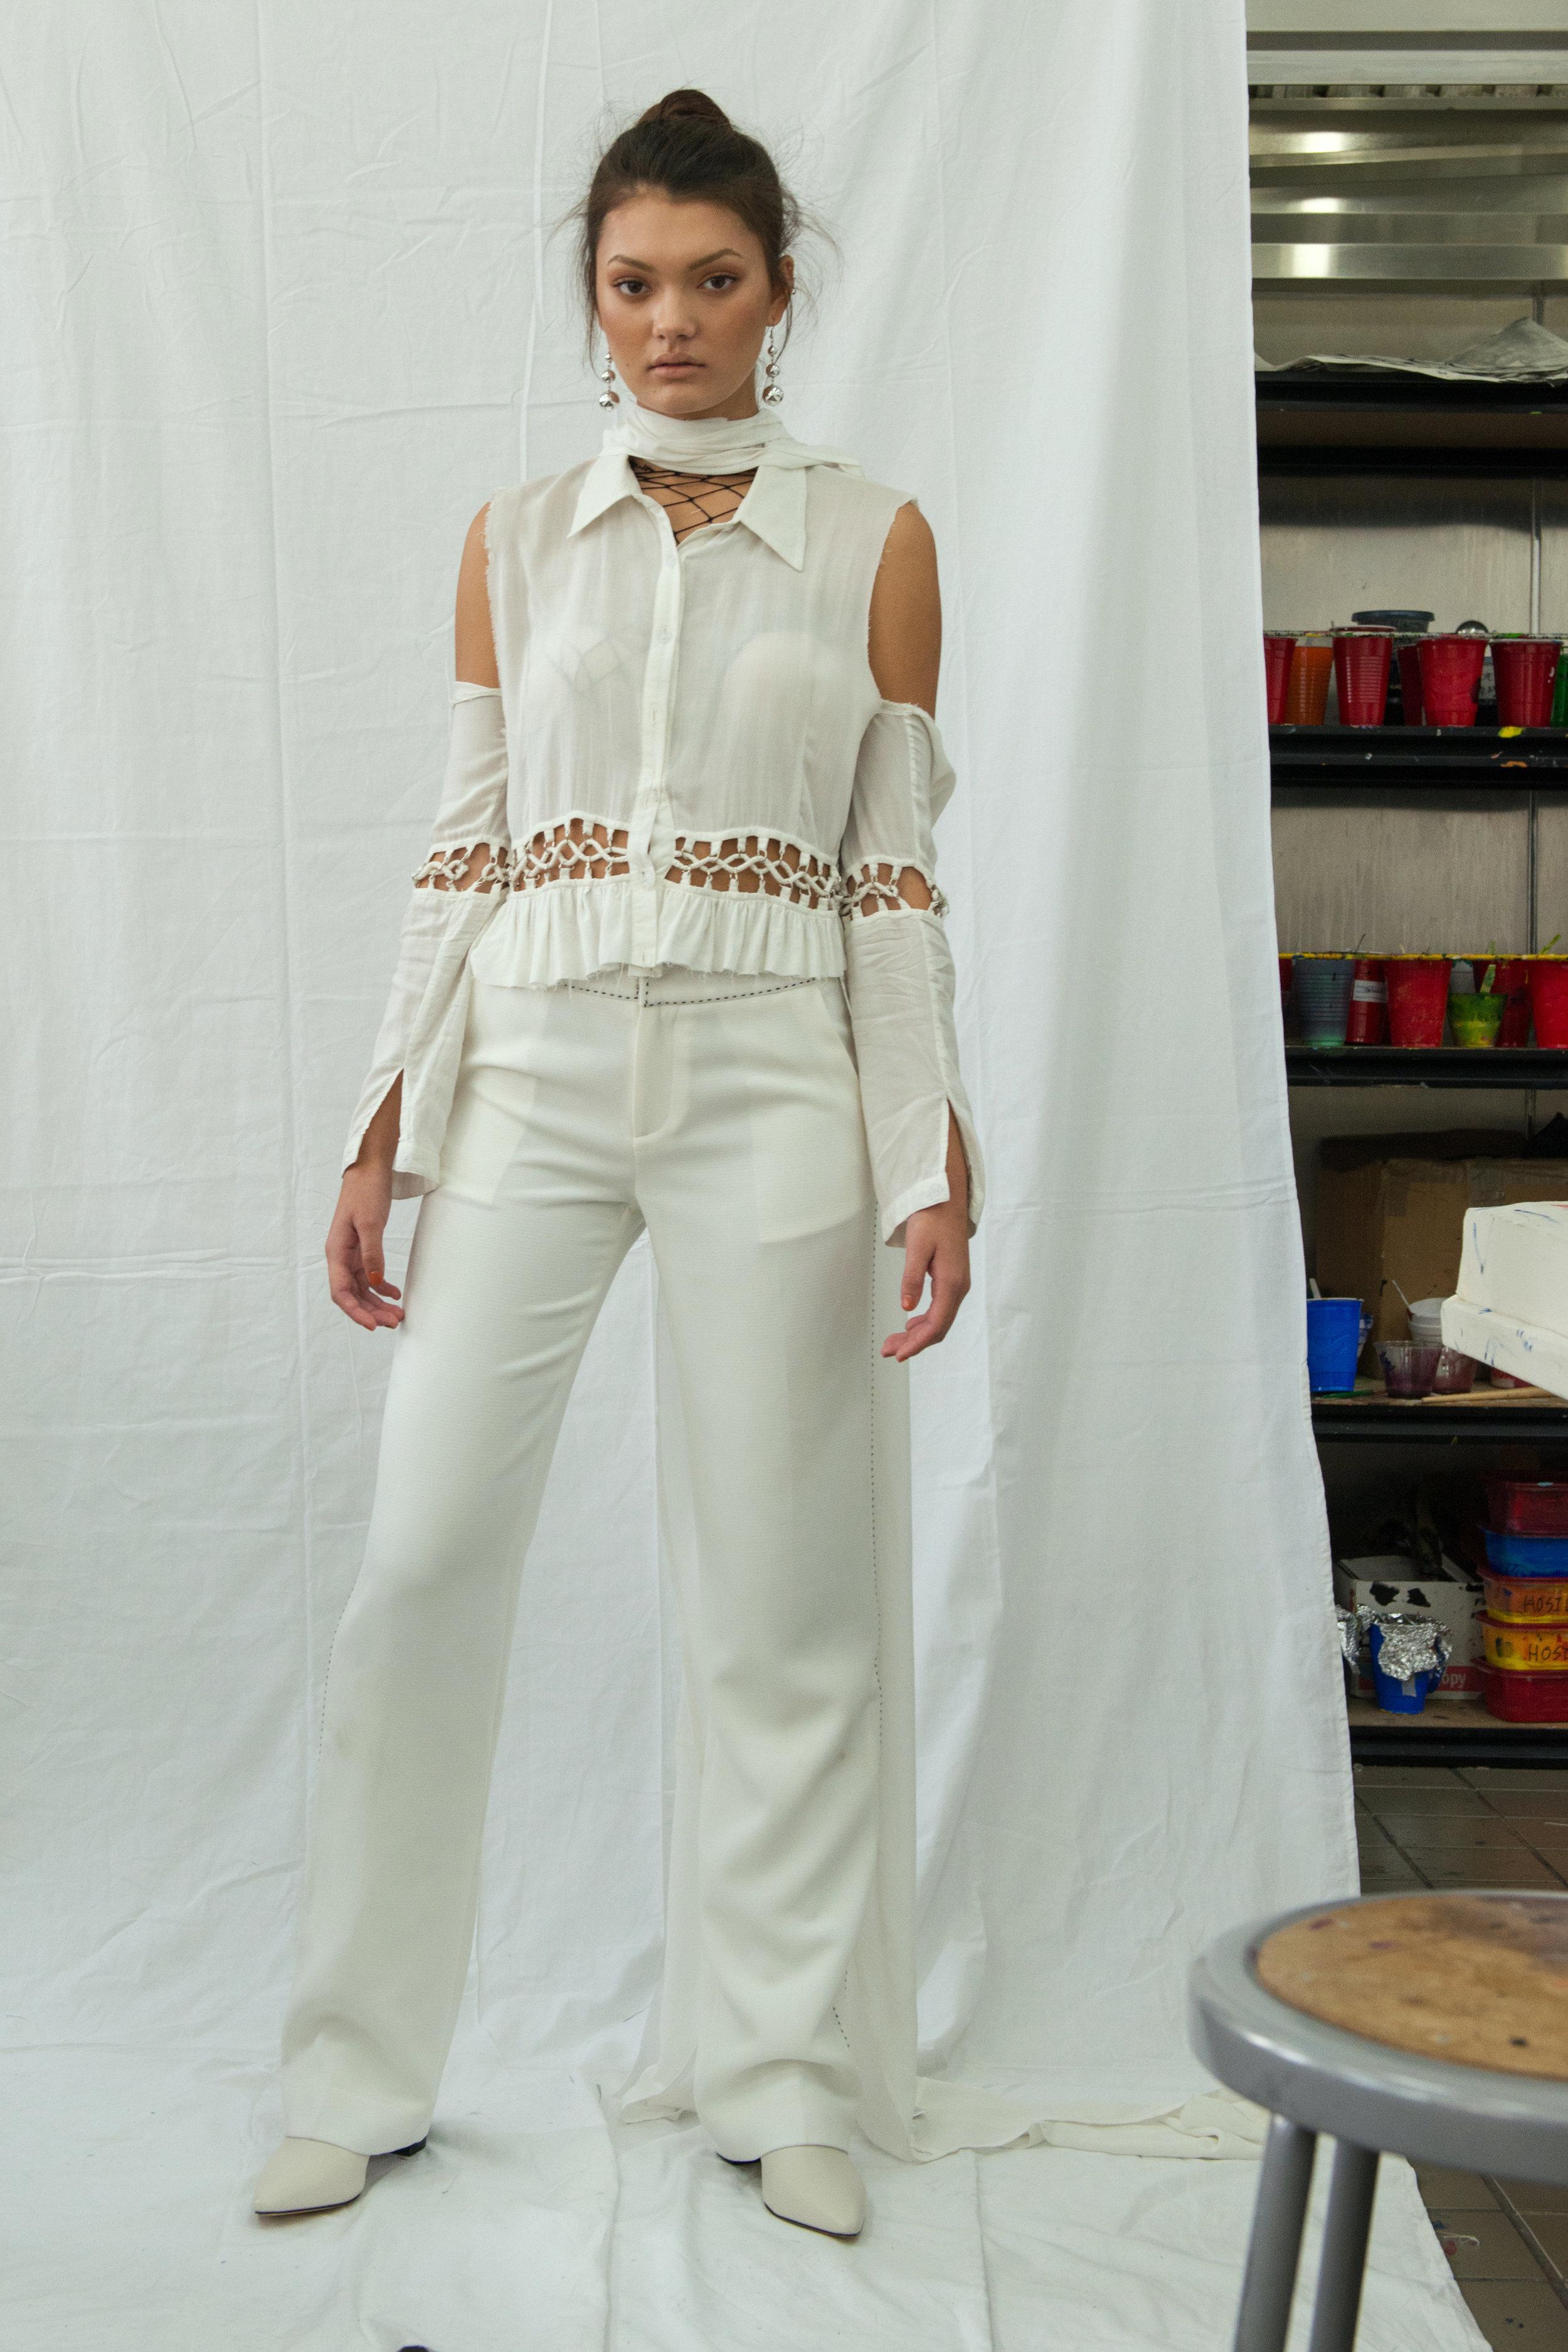 top VINTAGE, trousers  HANLEY ,boots  CALVIN KLEIN ,accessories STYLIST'S ARCHIVE